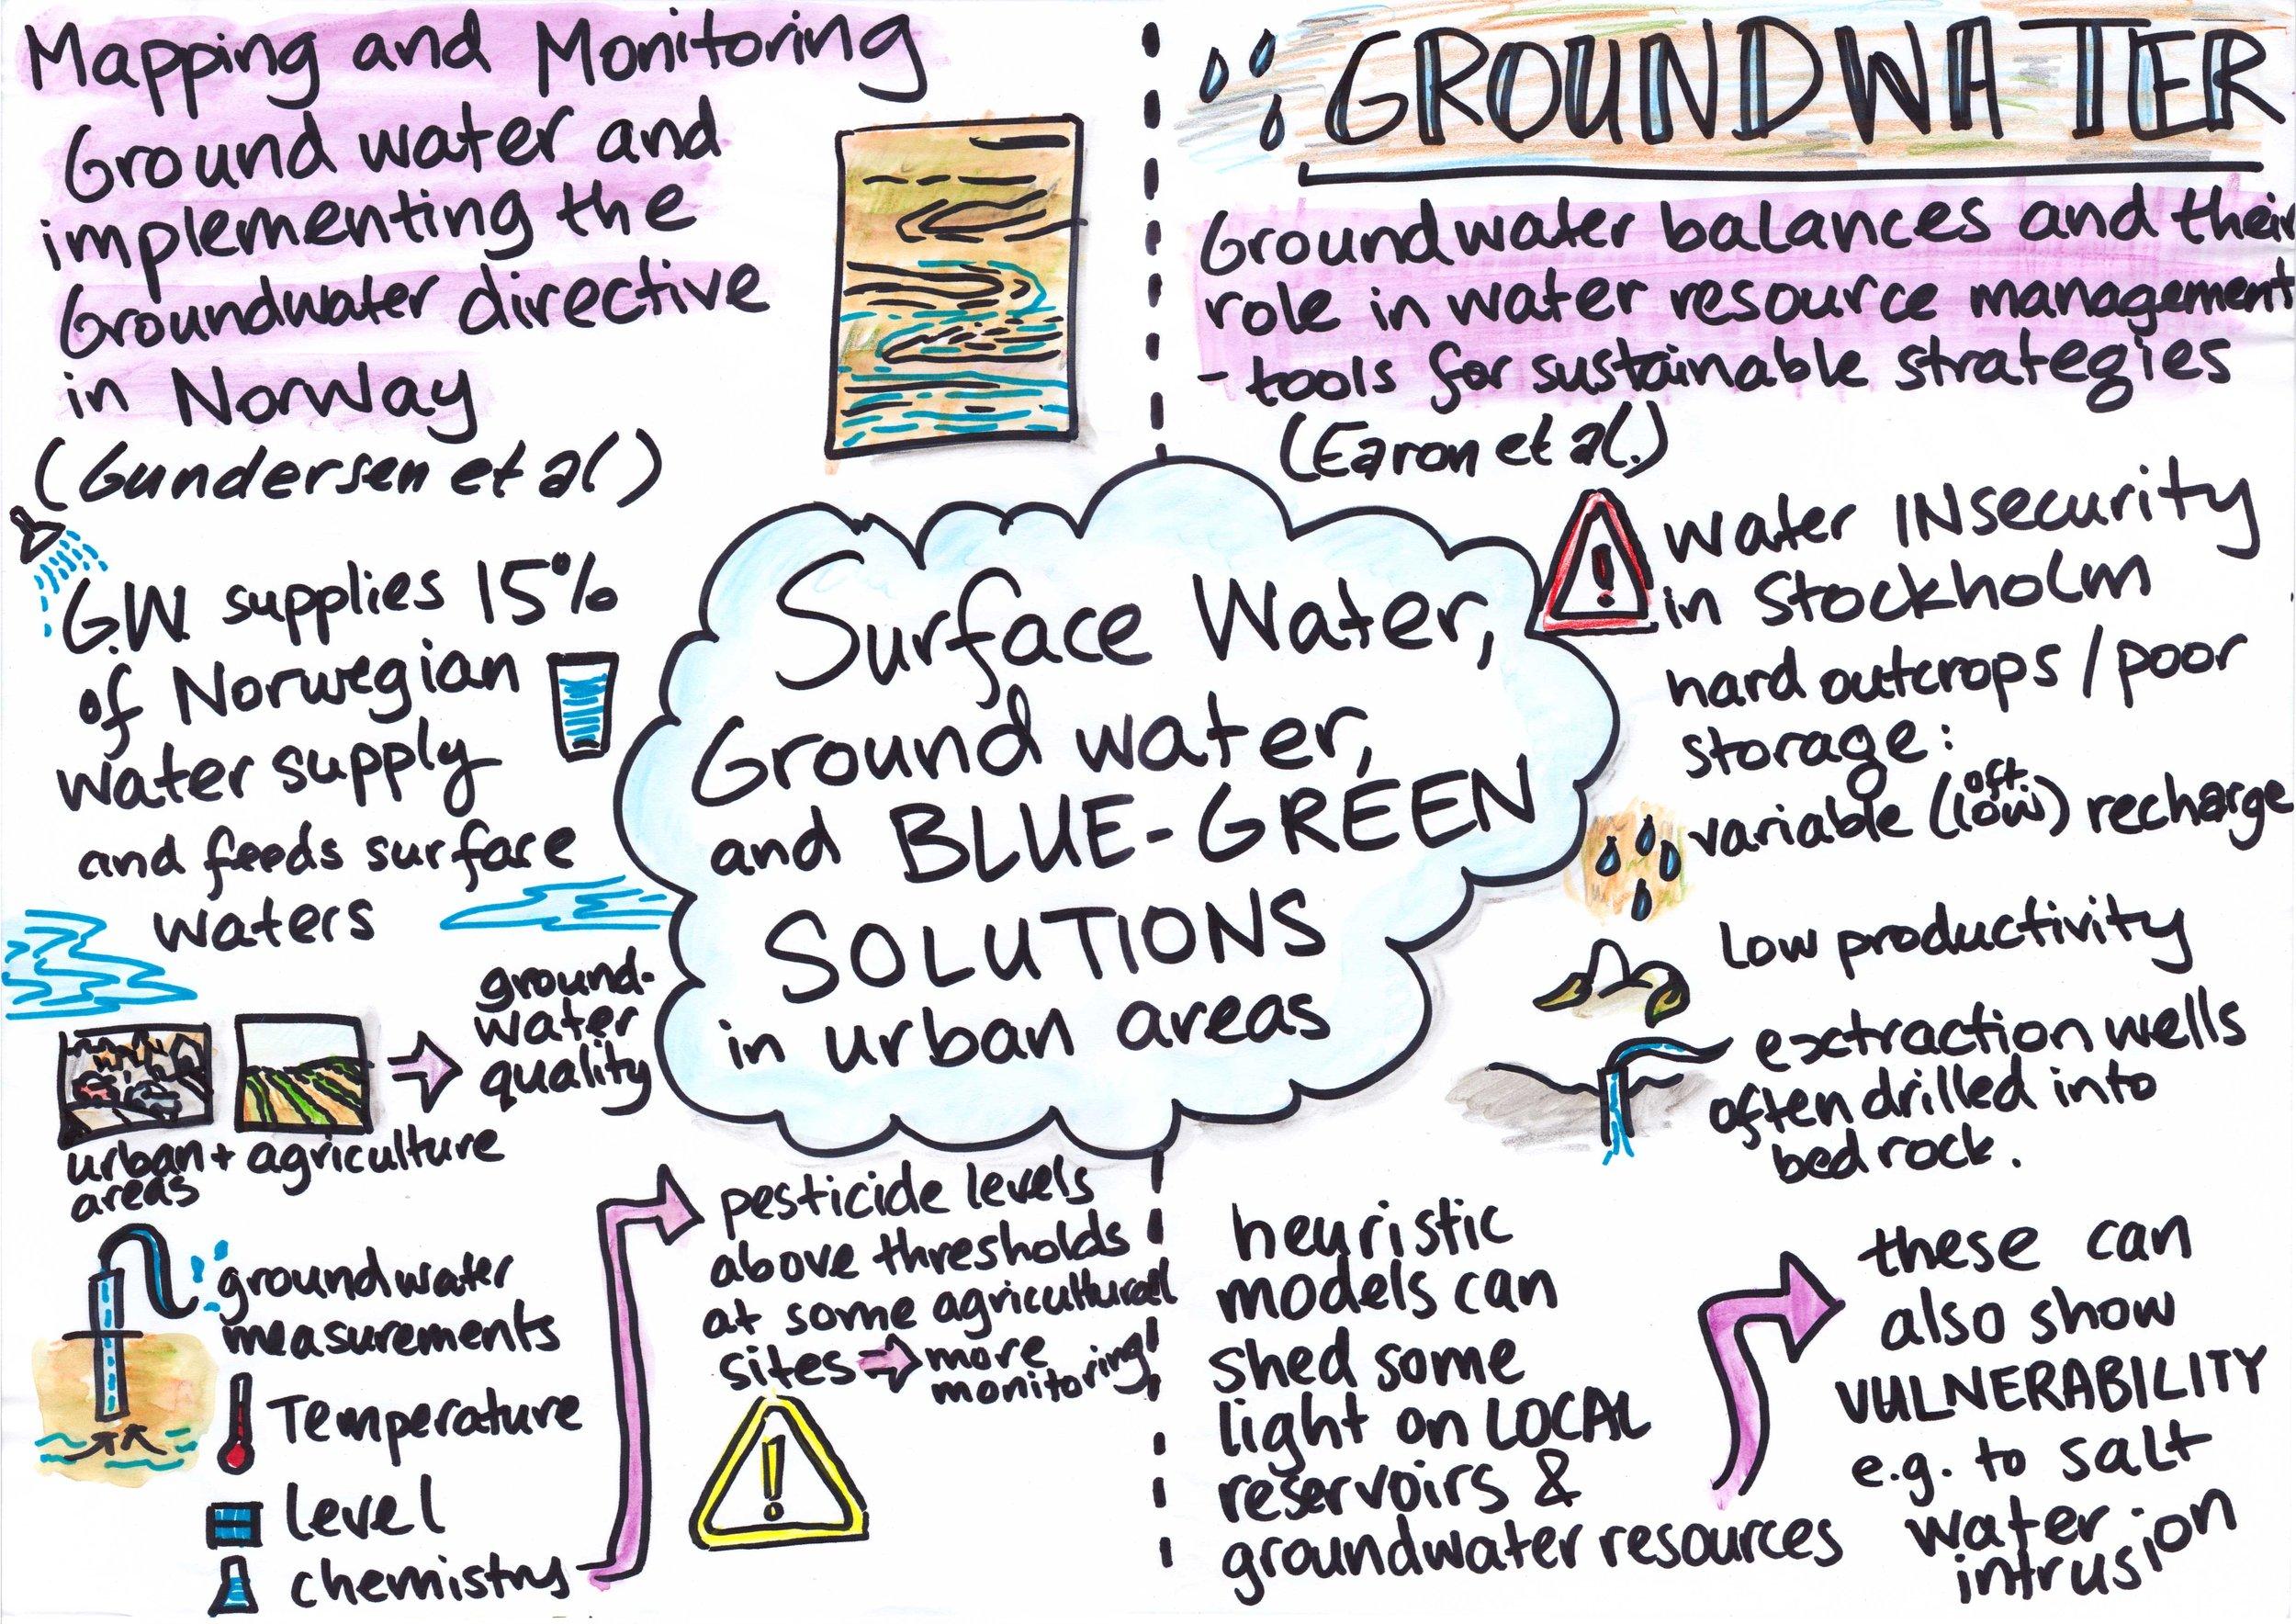 bluegreensolutions-groundwater.jpg